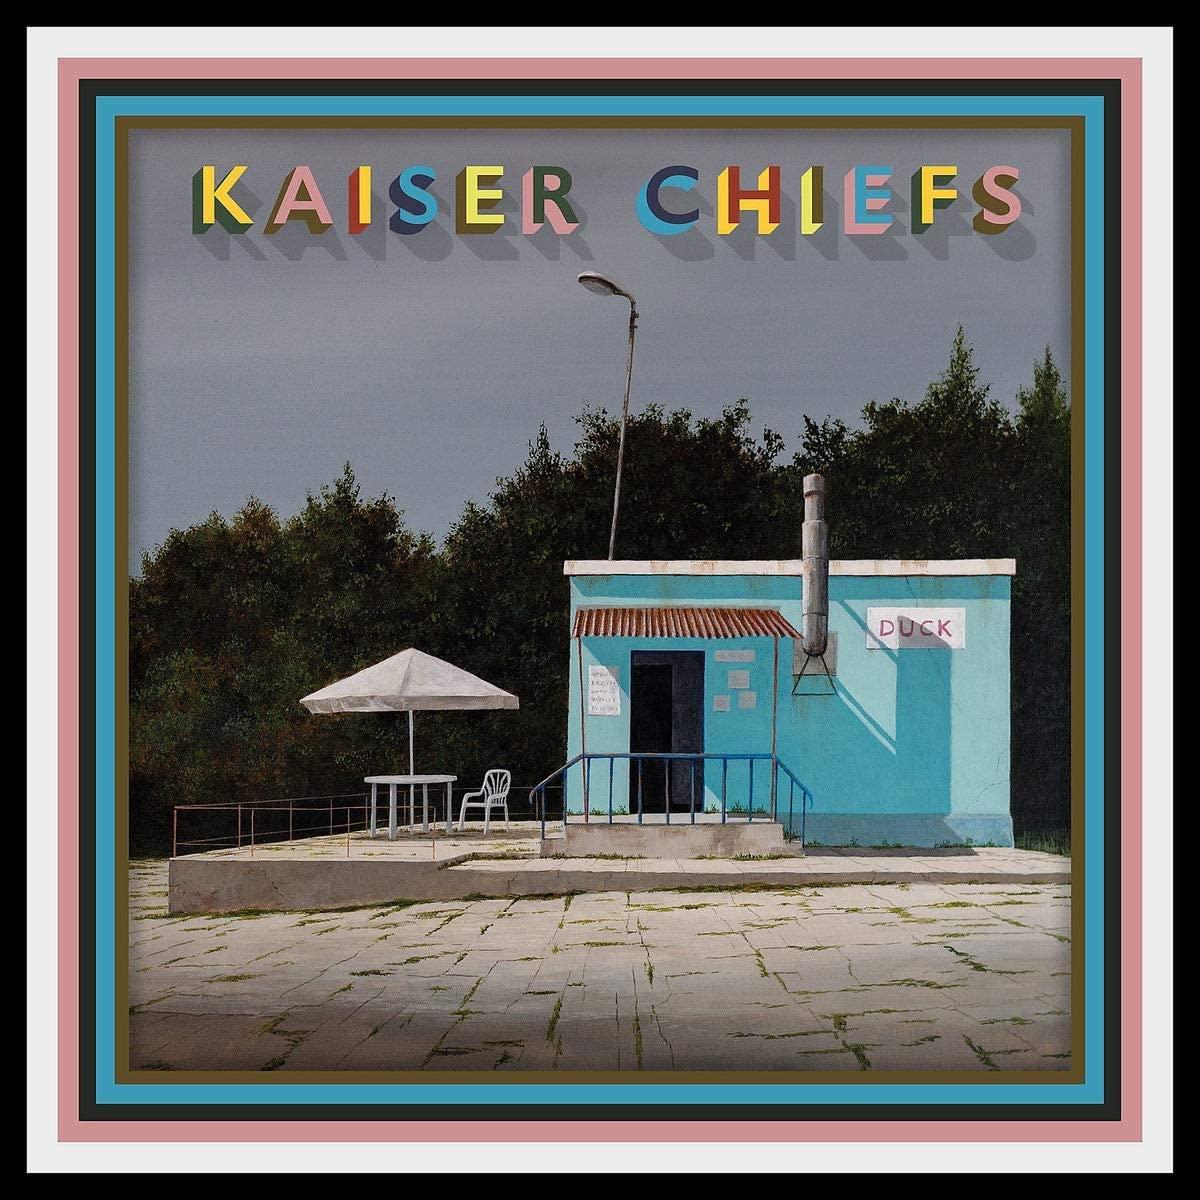 Kaiser Chiefs – Duck Limited Edition Blue Vinyl